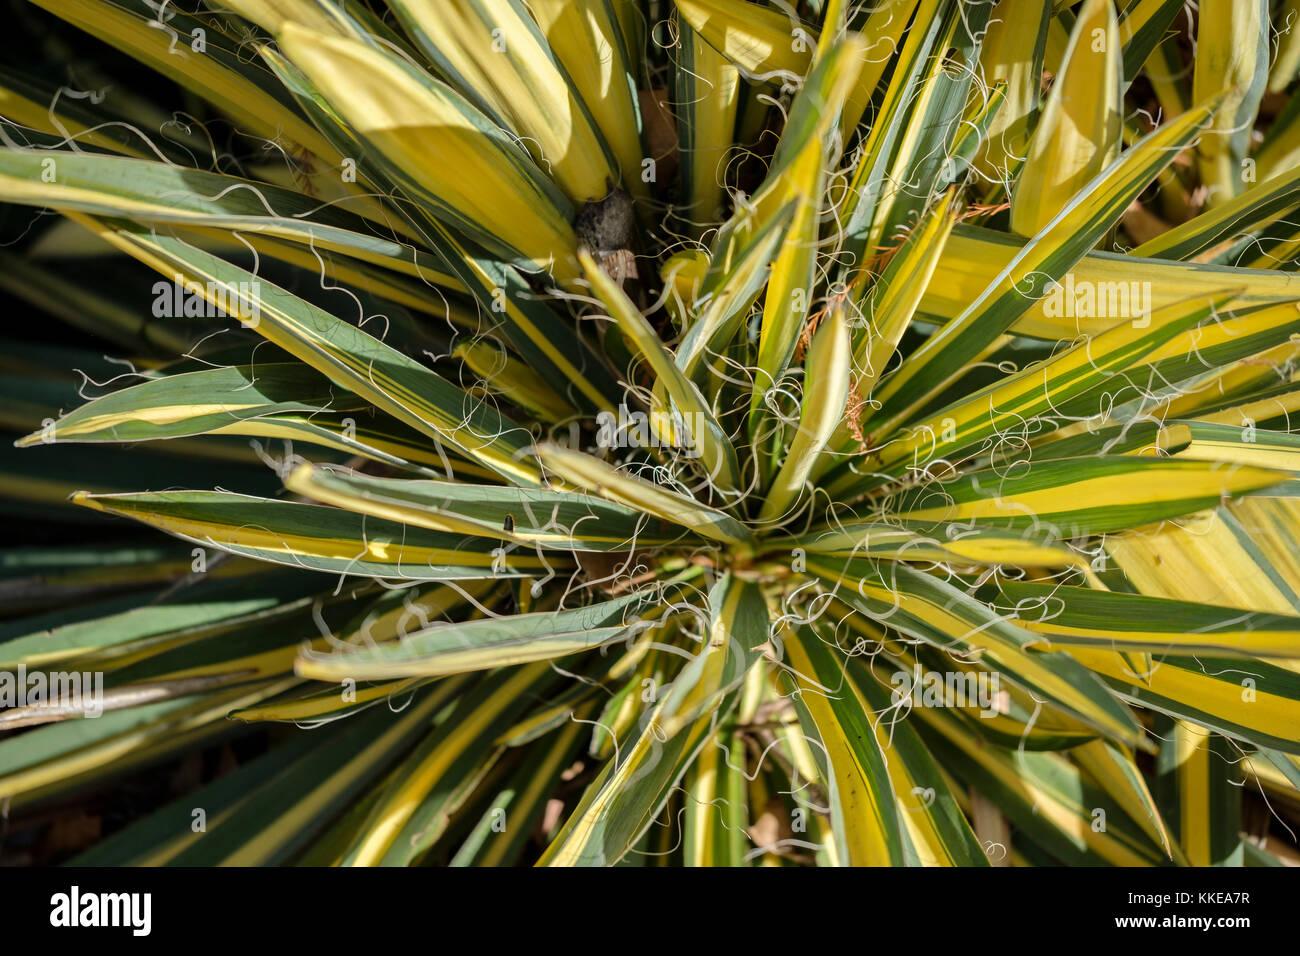 Yucca Color Guard, Yucca filamentosa, in einem botanischen Garten in Oklahoma City, Oklahoma, USA wächst. Stockbild